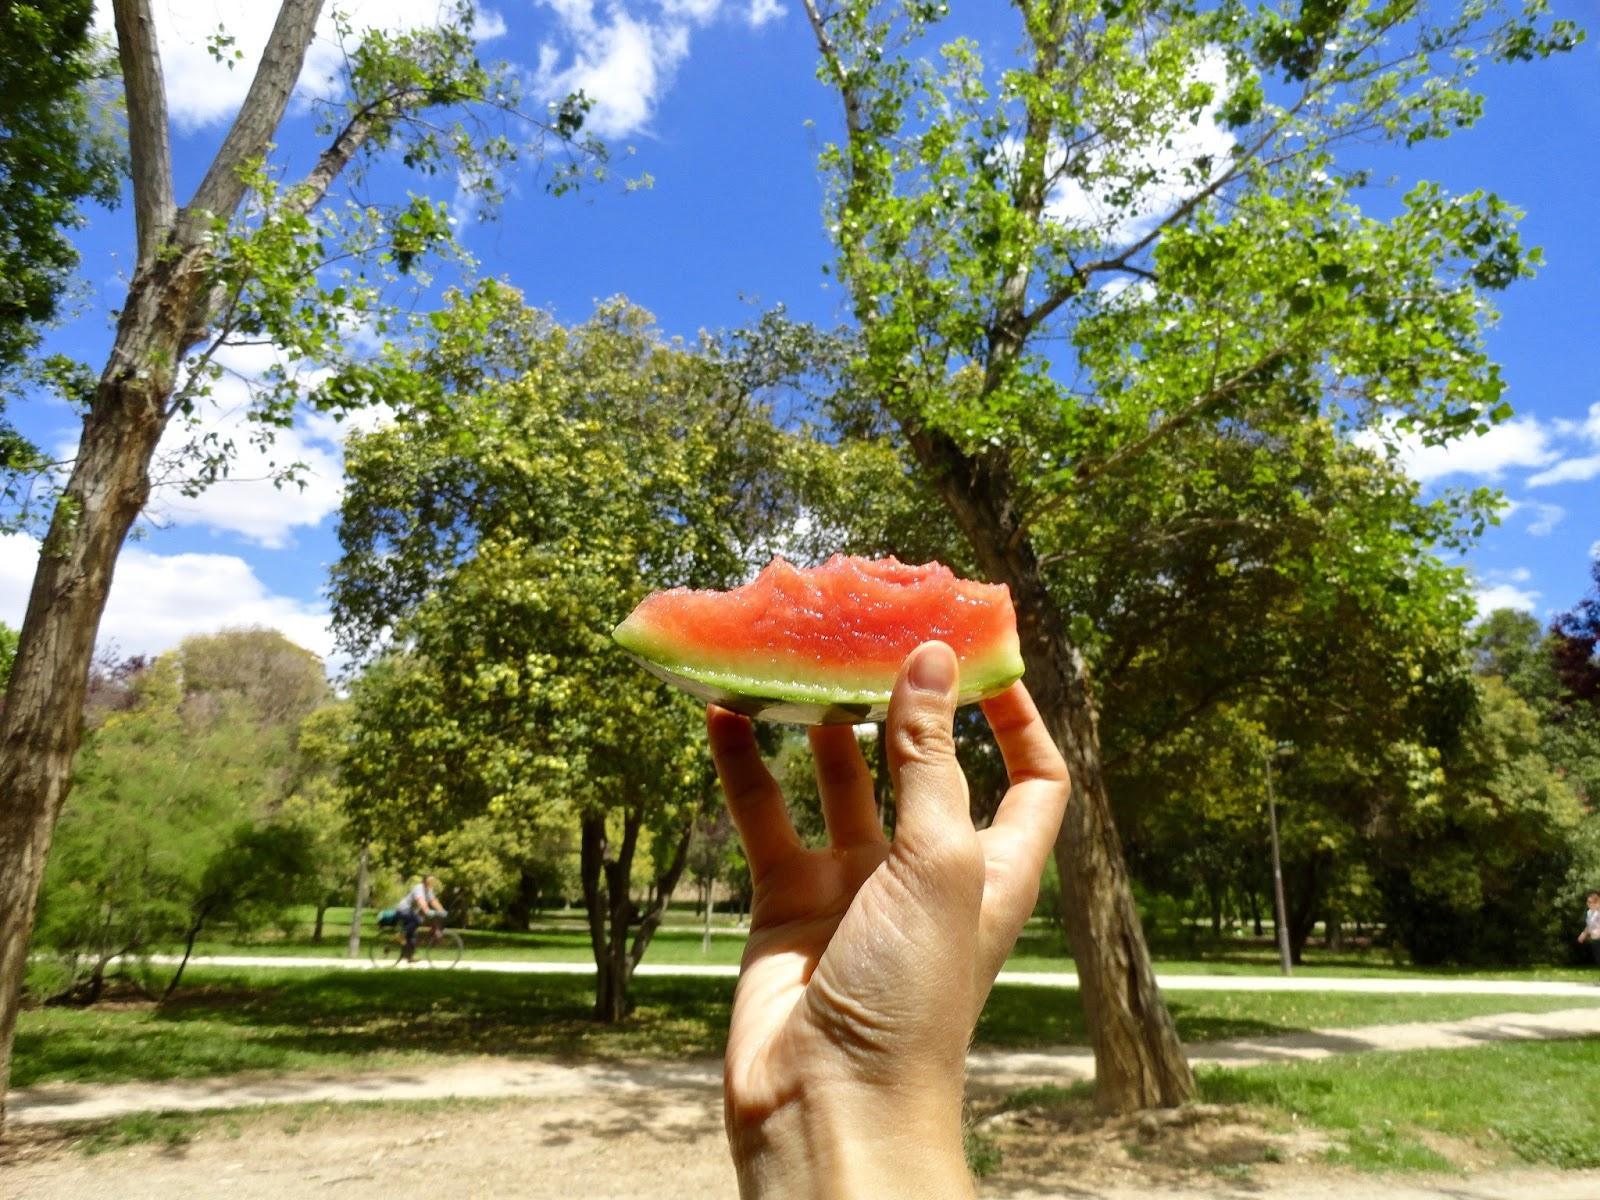 turia gardens valencia spain trees green watermelon